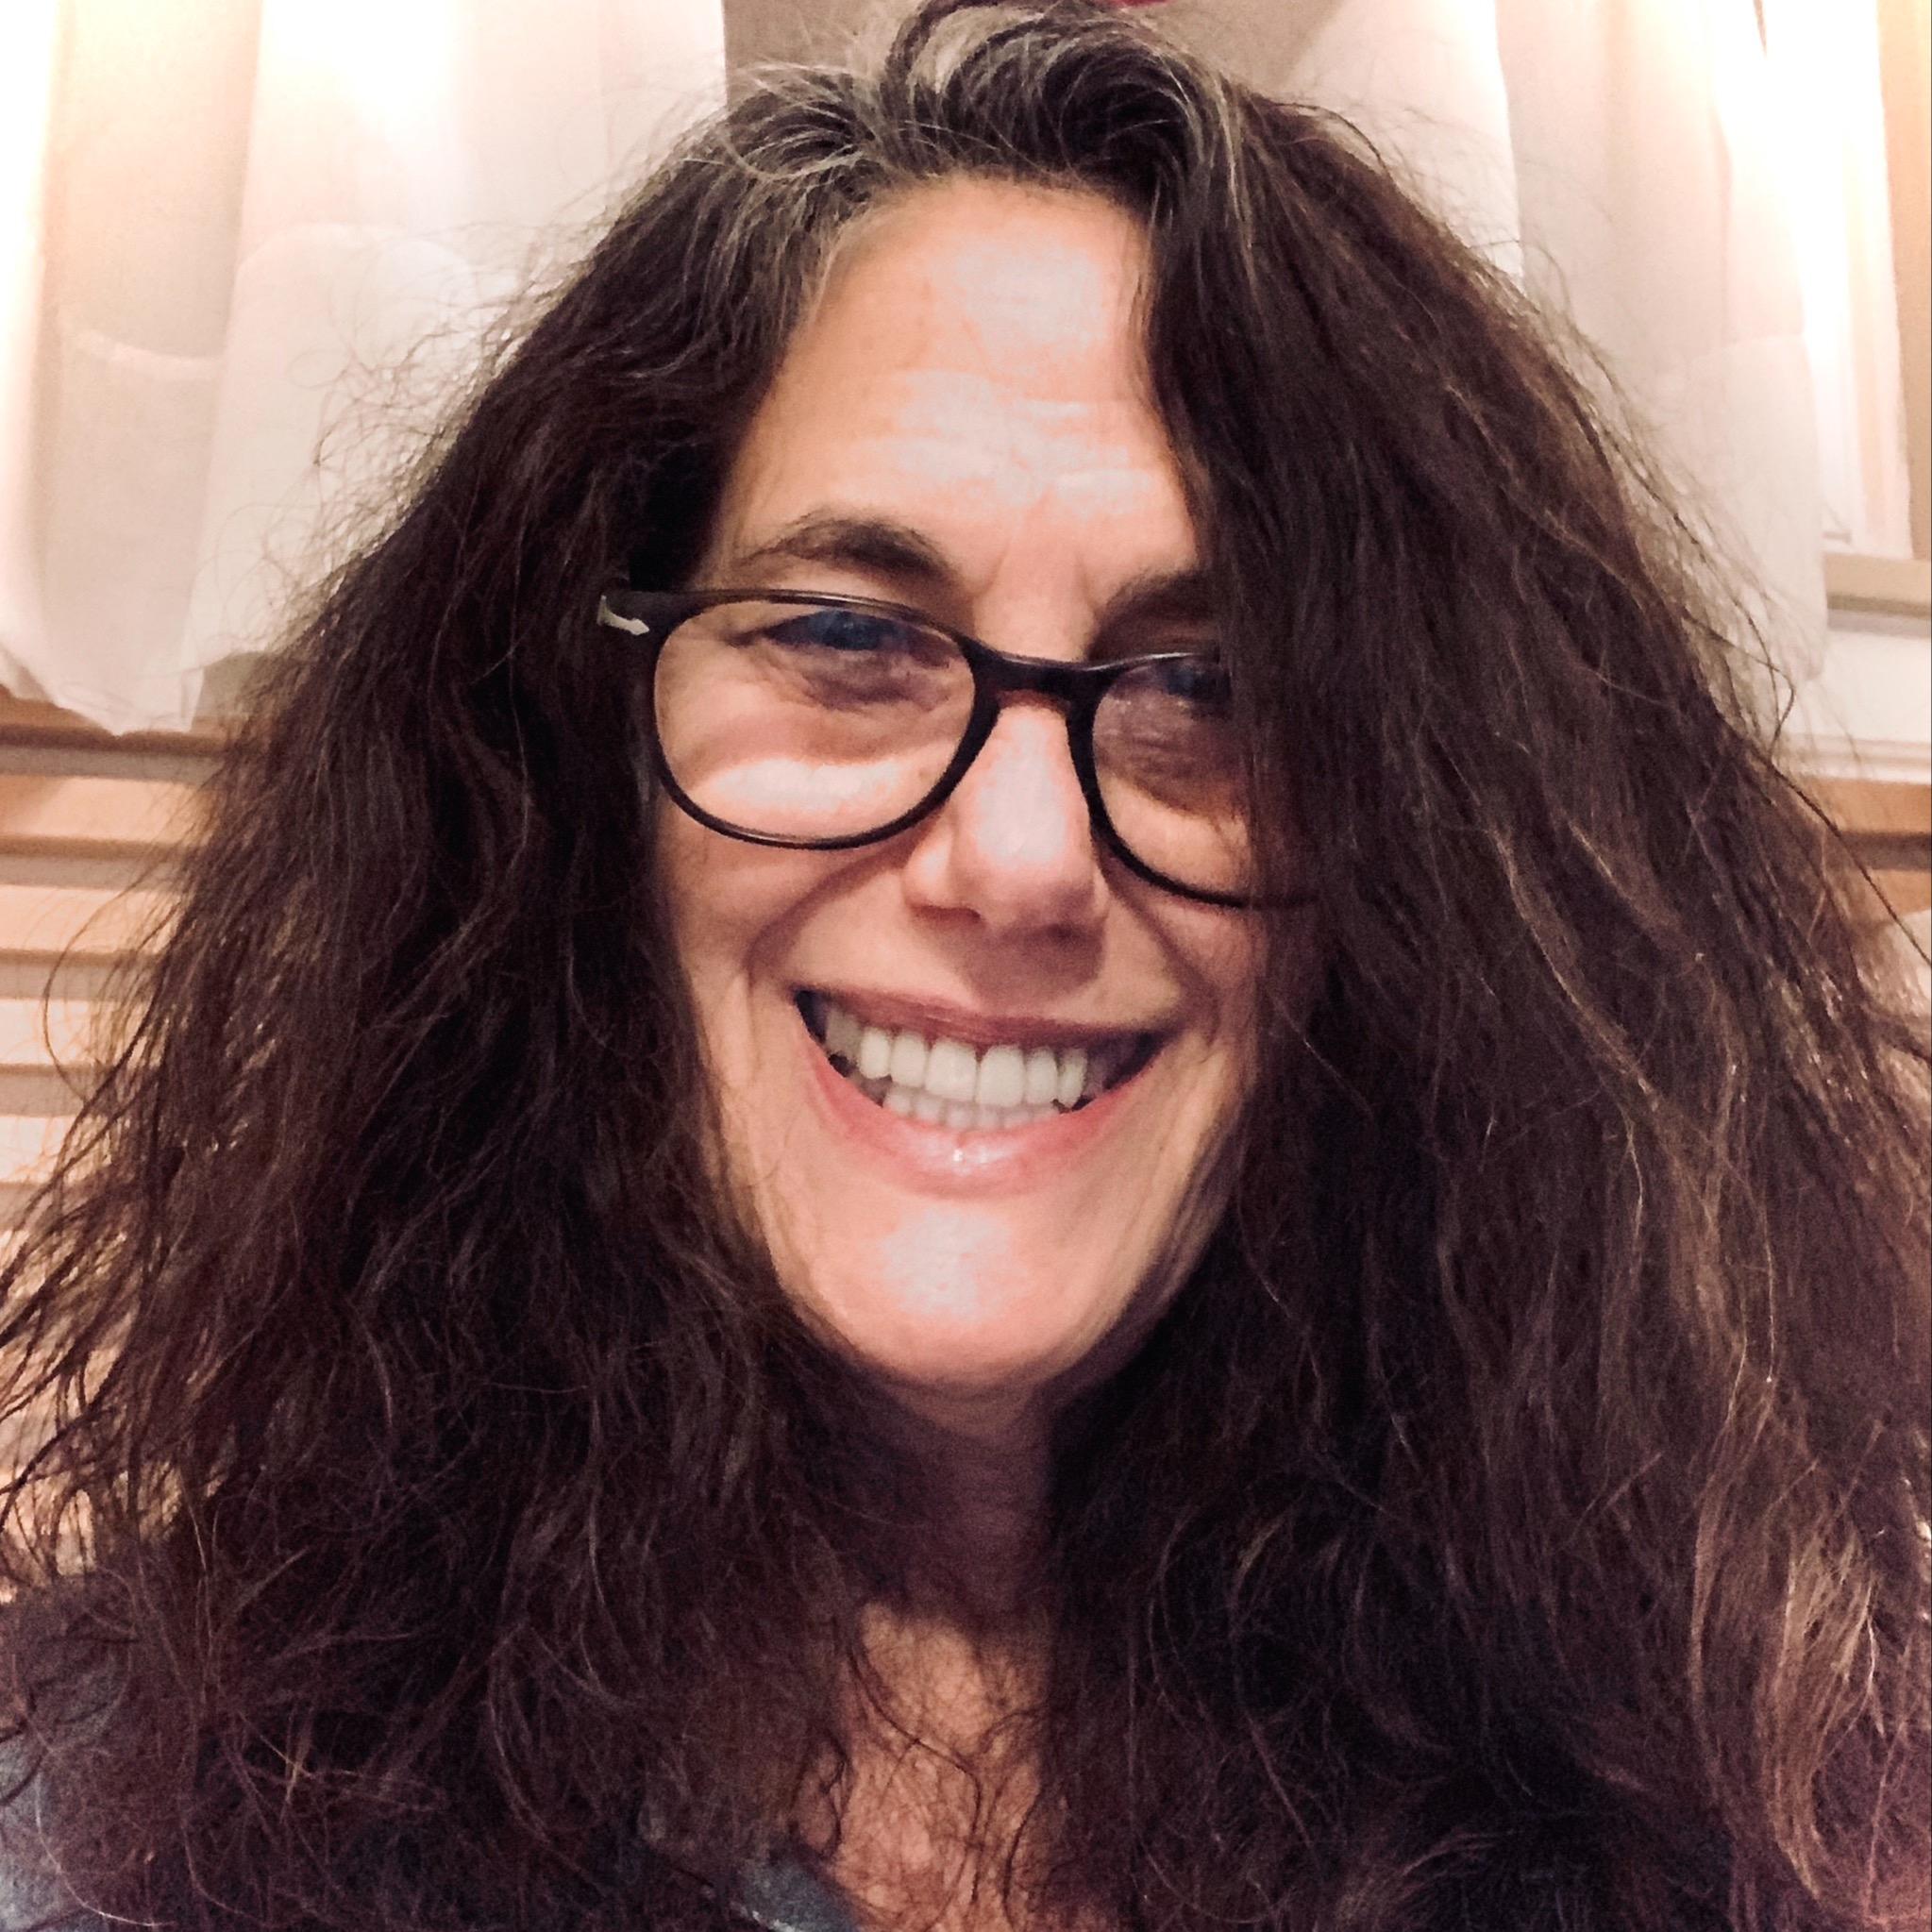 Ellen Radha Katz